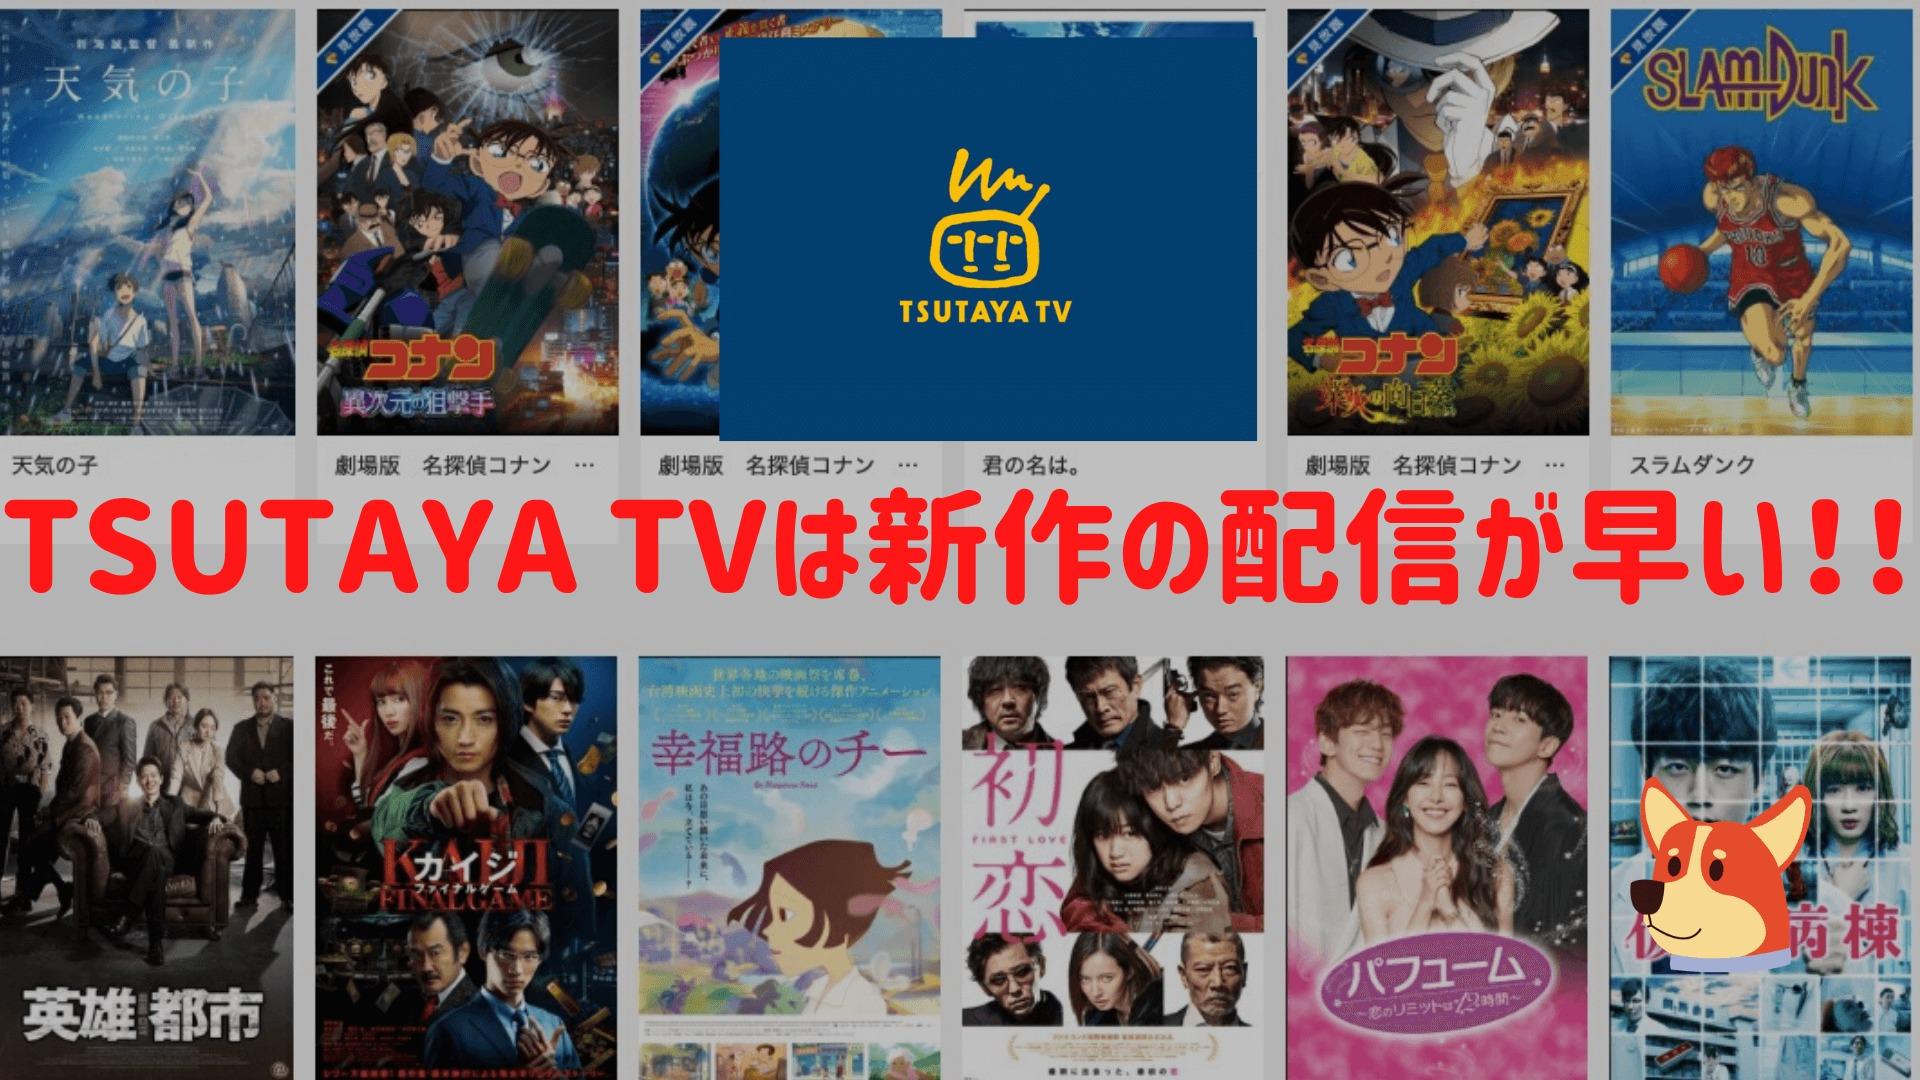 TSUTAYA TVのメリットは新作のレンタル開始が早いと説明している